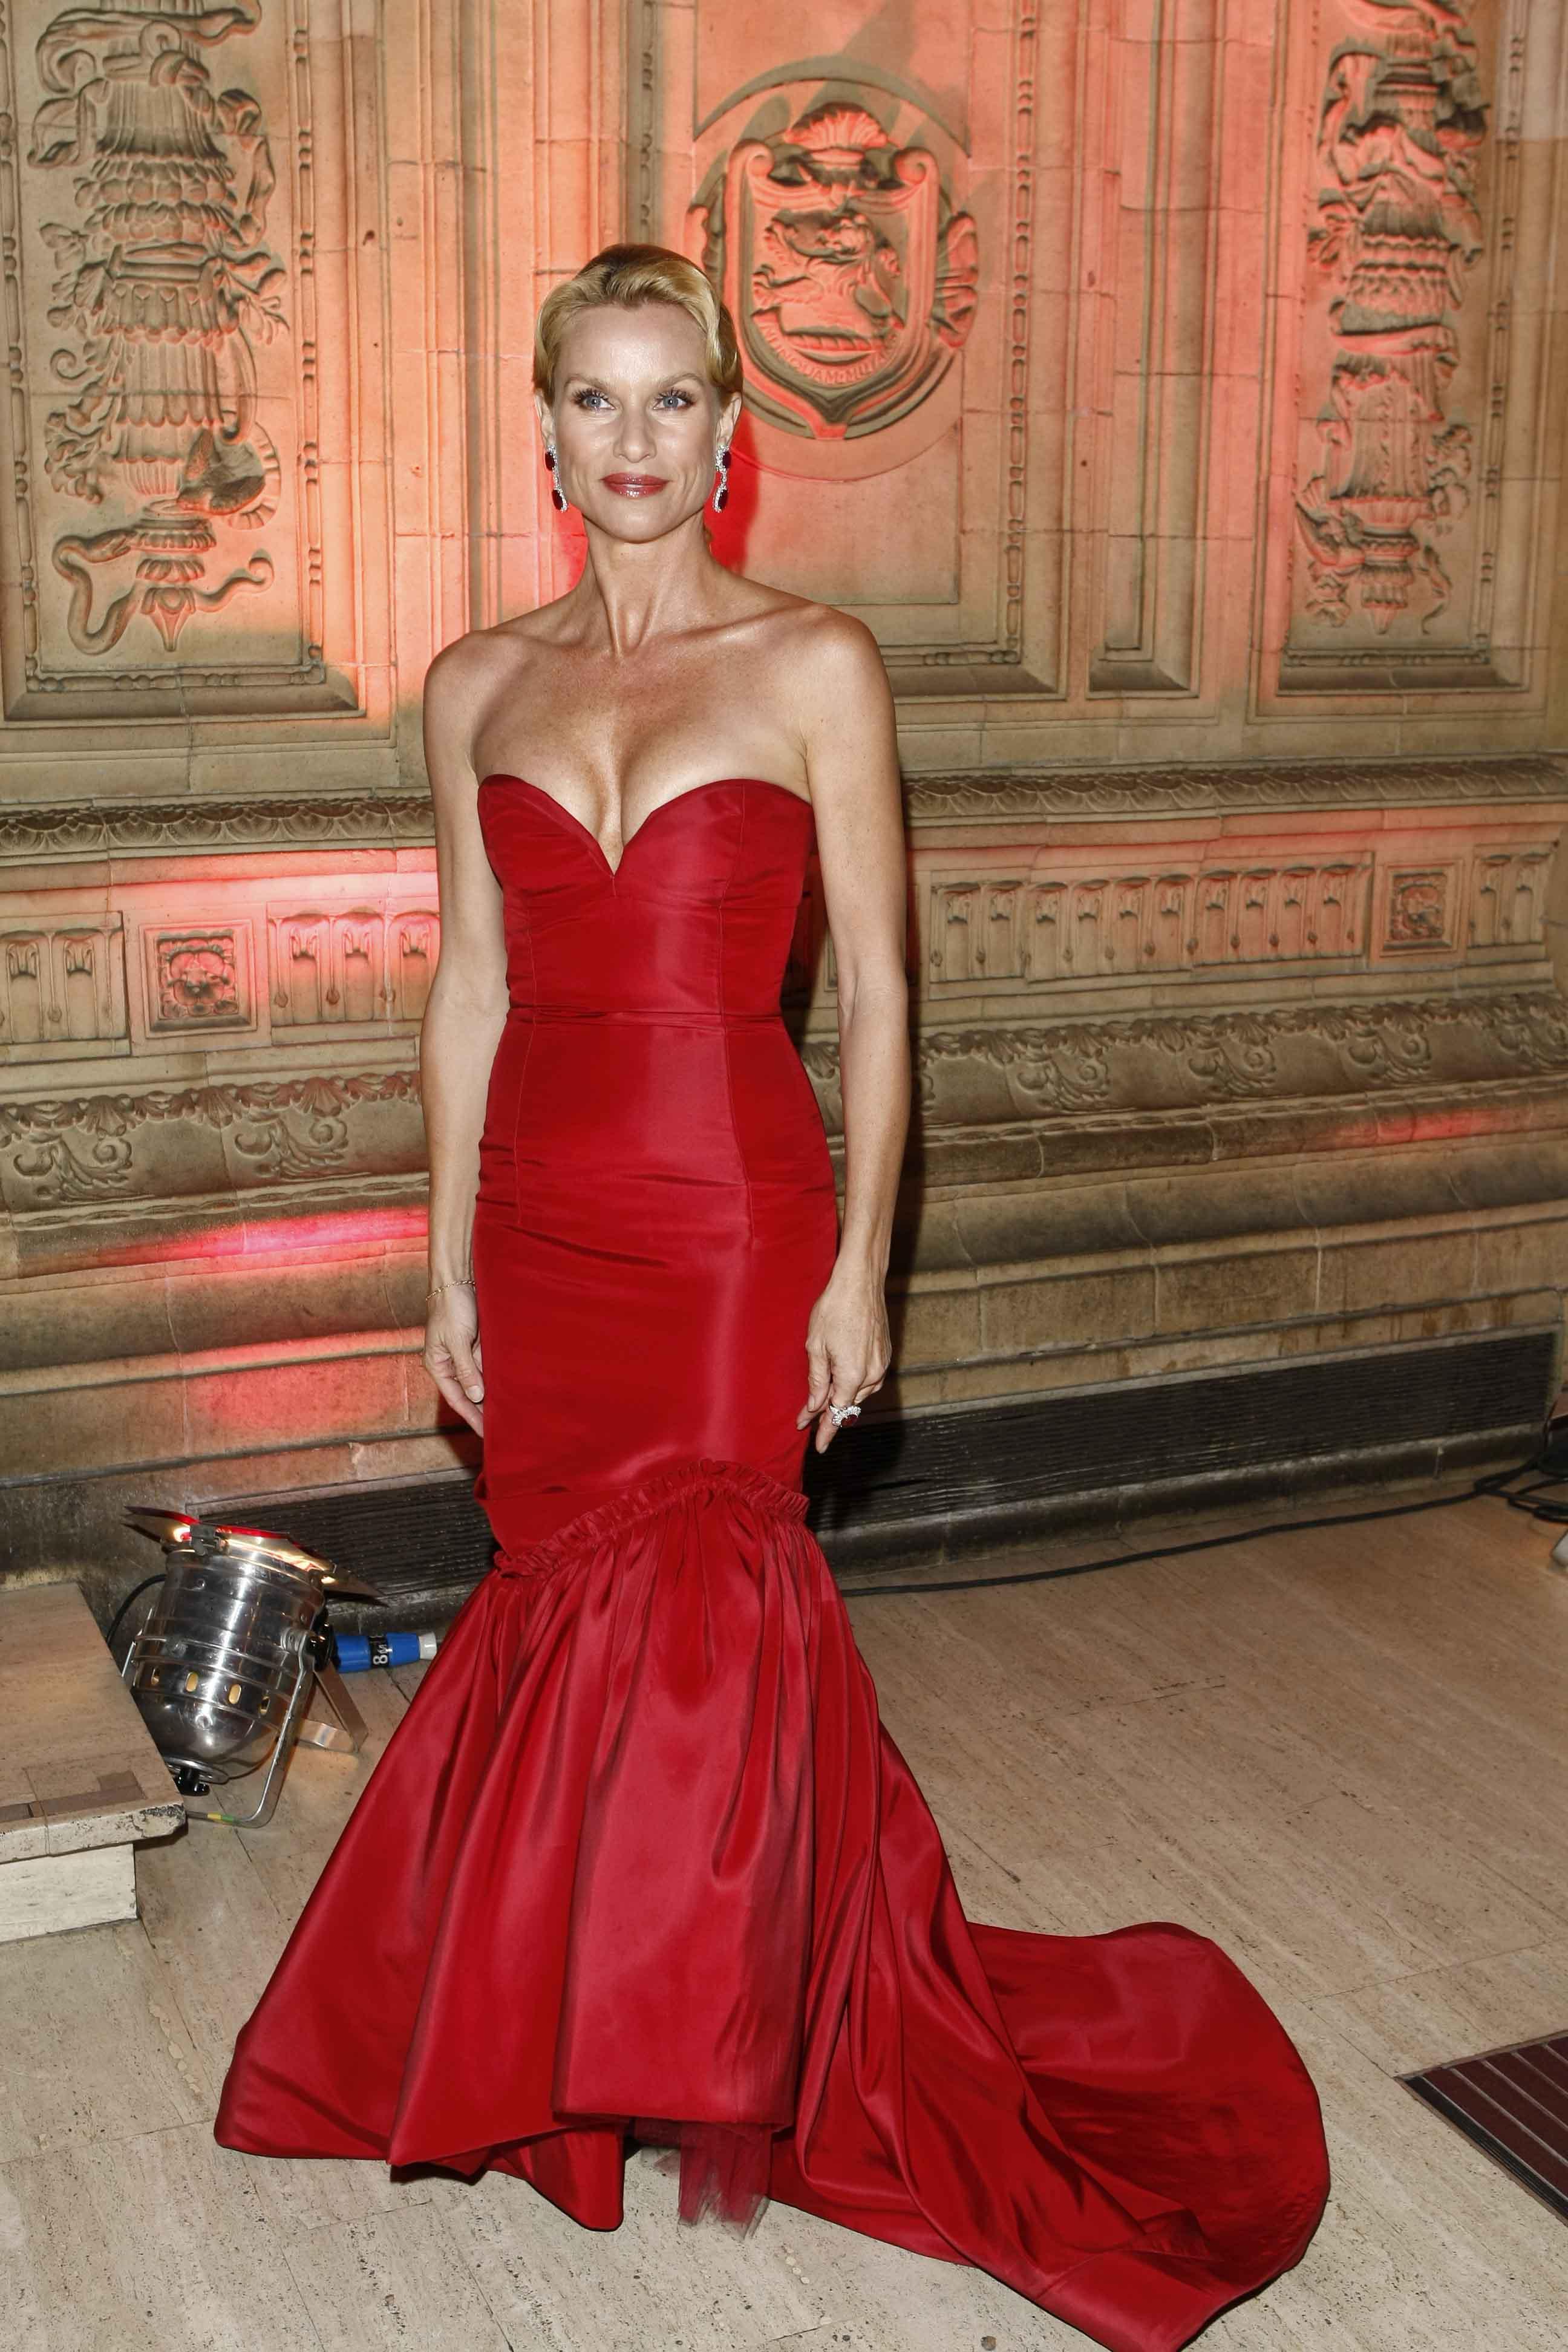 15510_Celebutopia-Nicollette_Sheridan-2008_National_Television_Awards-13_122_1090lo.jpg